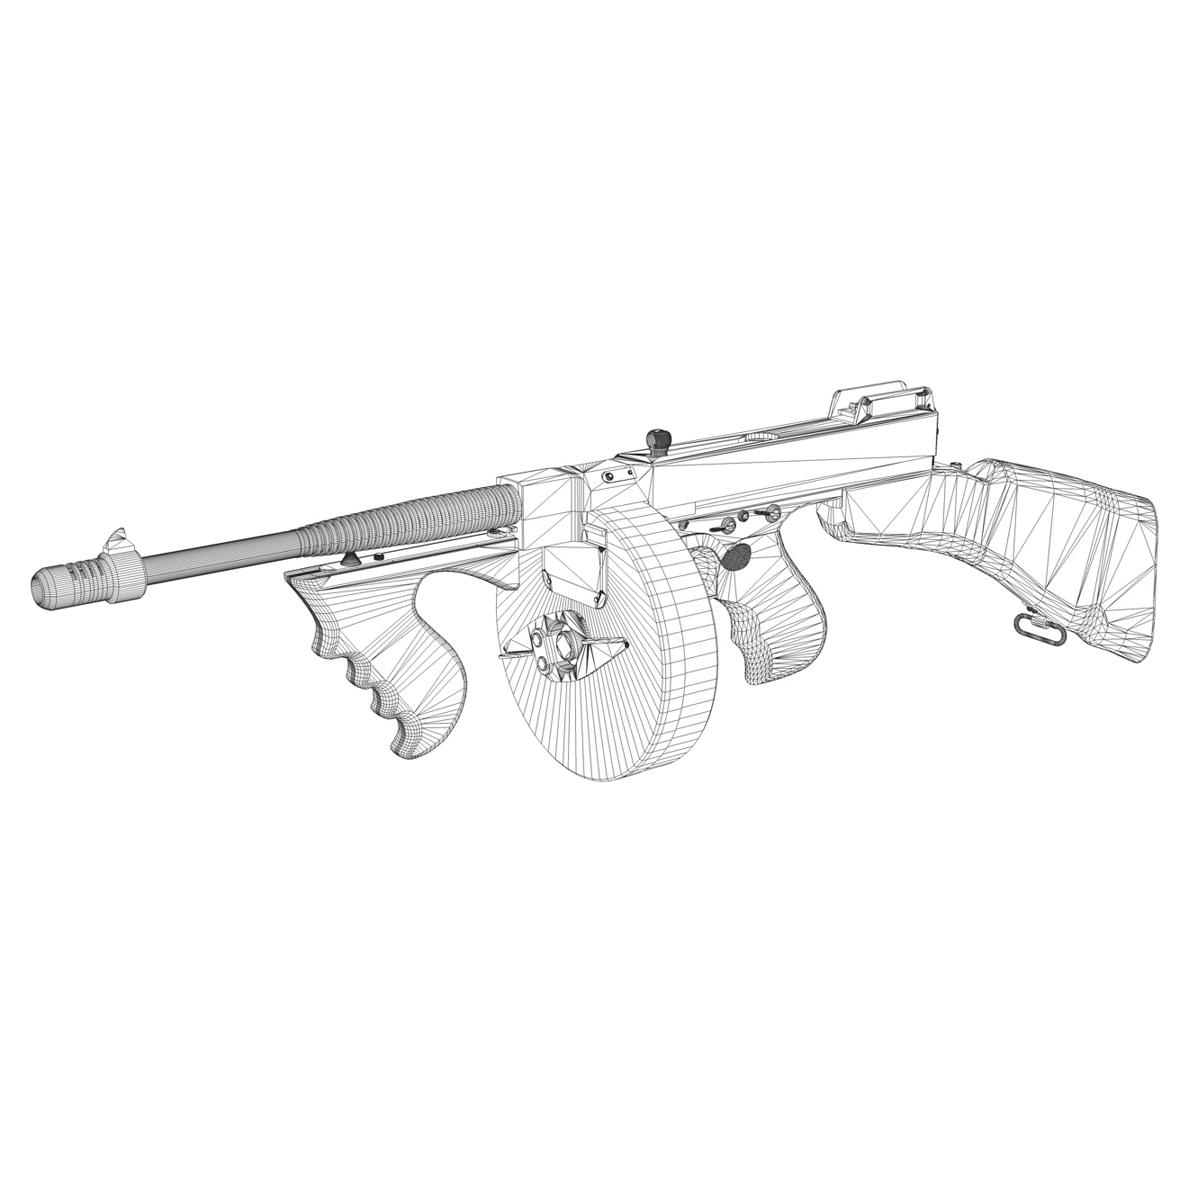 colt model1921 thompson submachine gun 3d model 3ds c4d lwo obj 264716